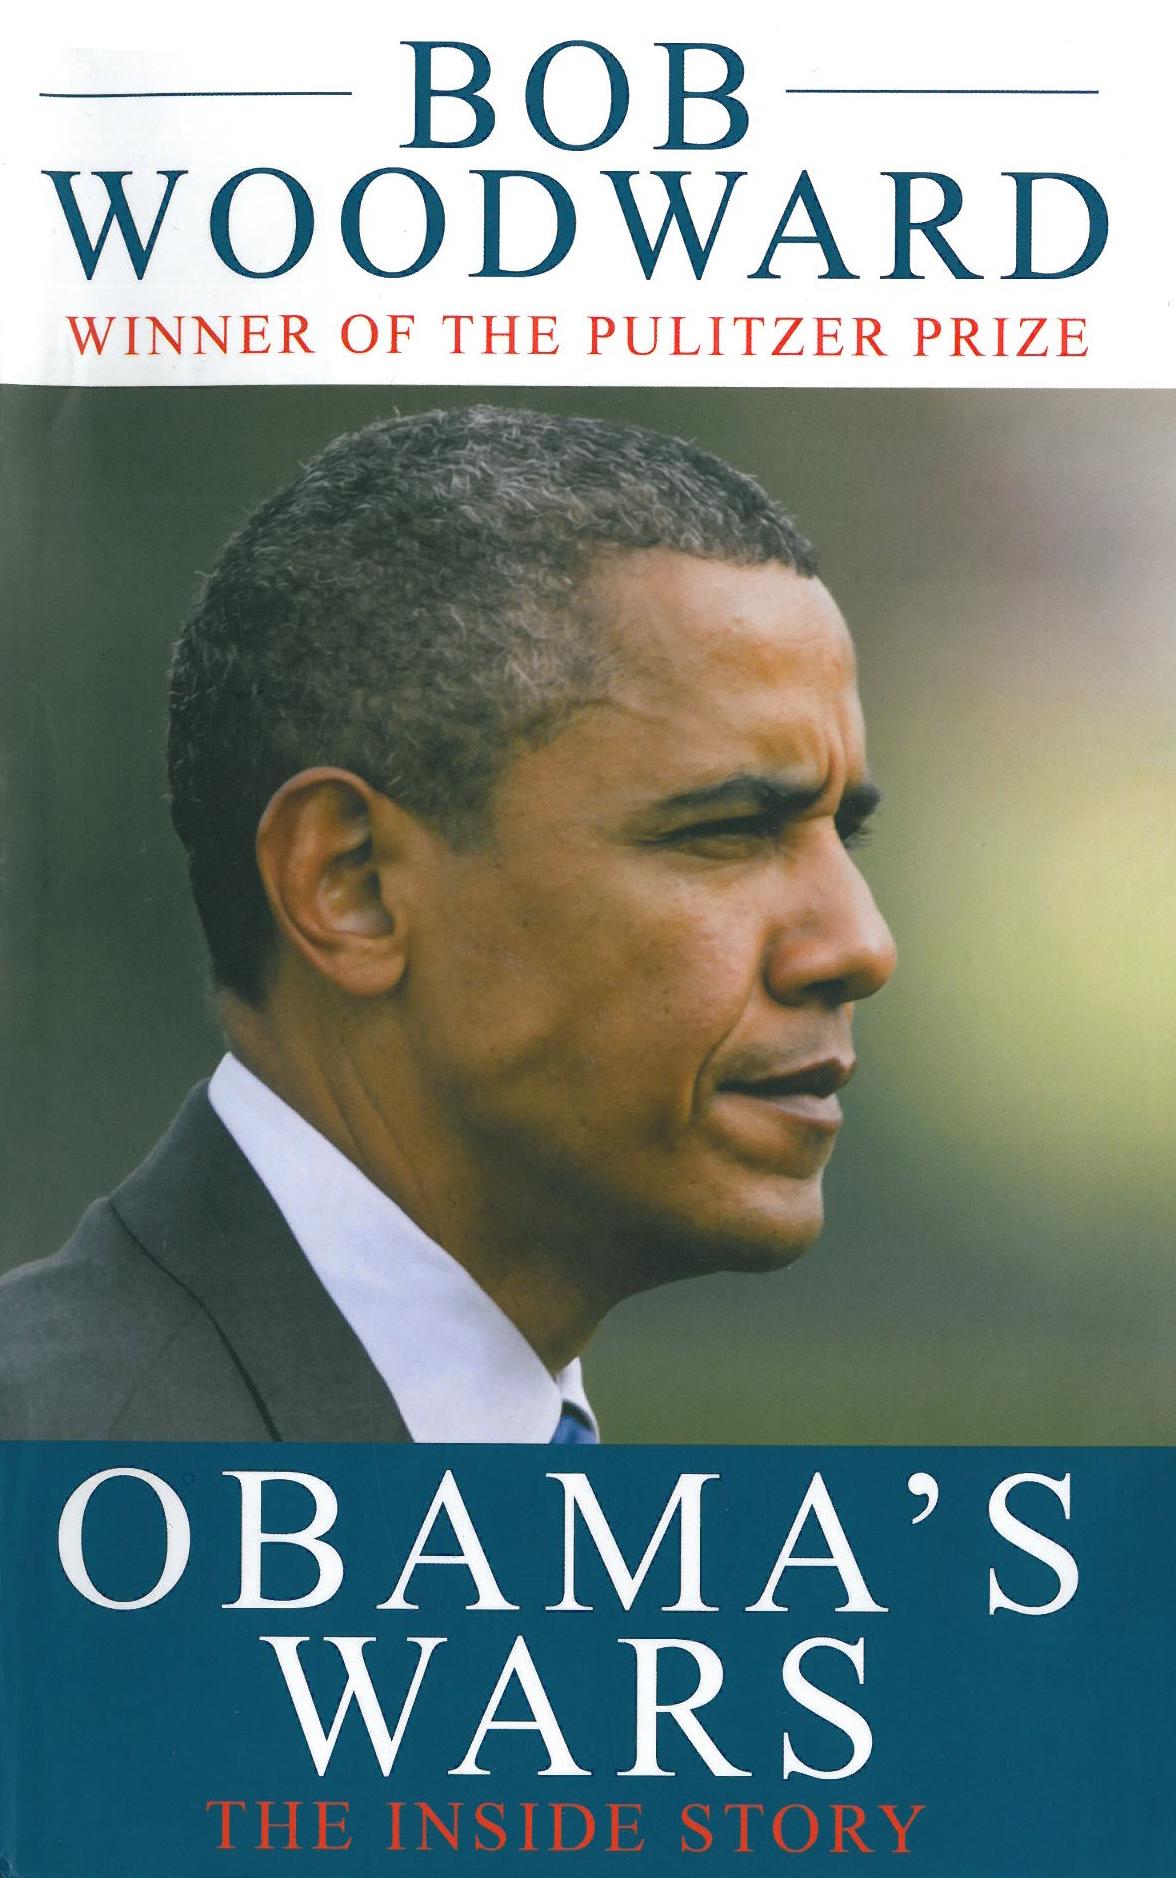 Bob Woodward: Obama's Wars. Simon & Schuster 2010, 441 s.